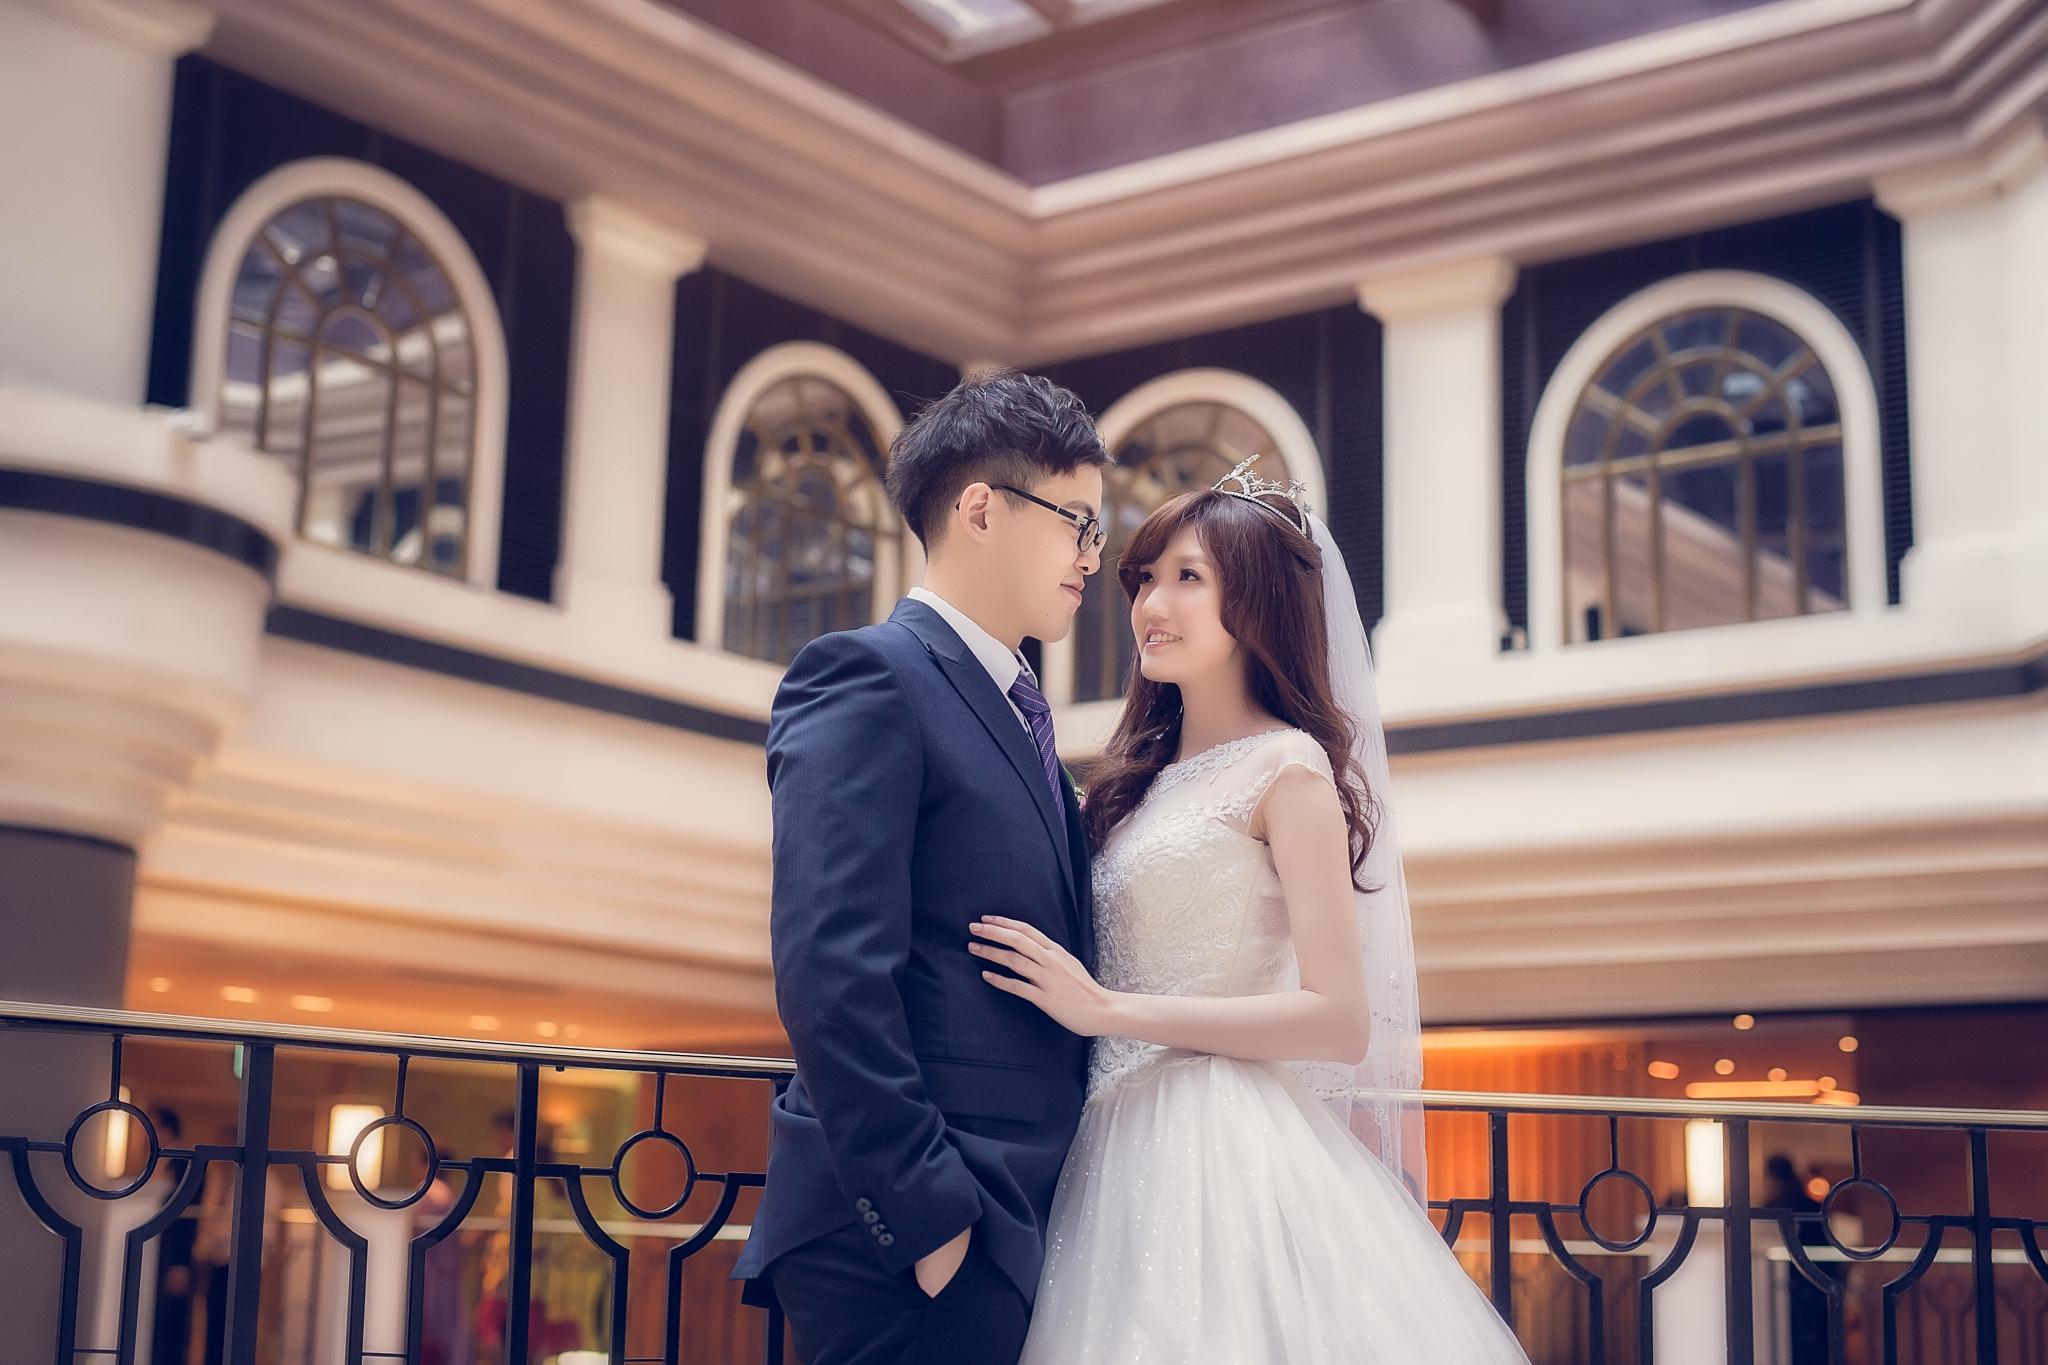 008-wedding